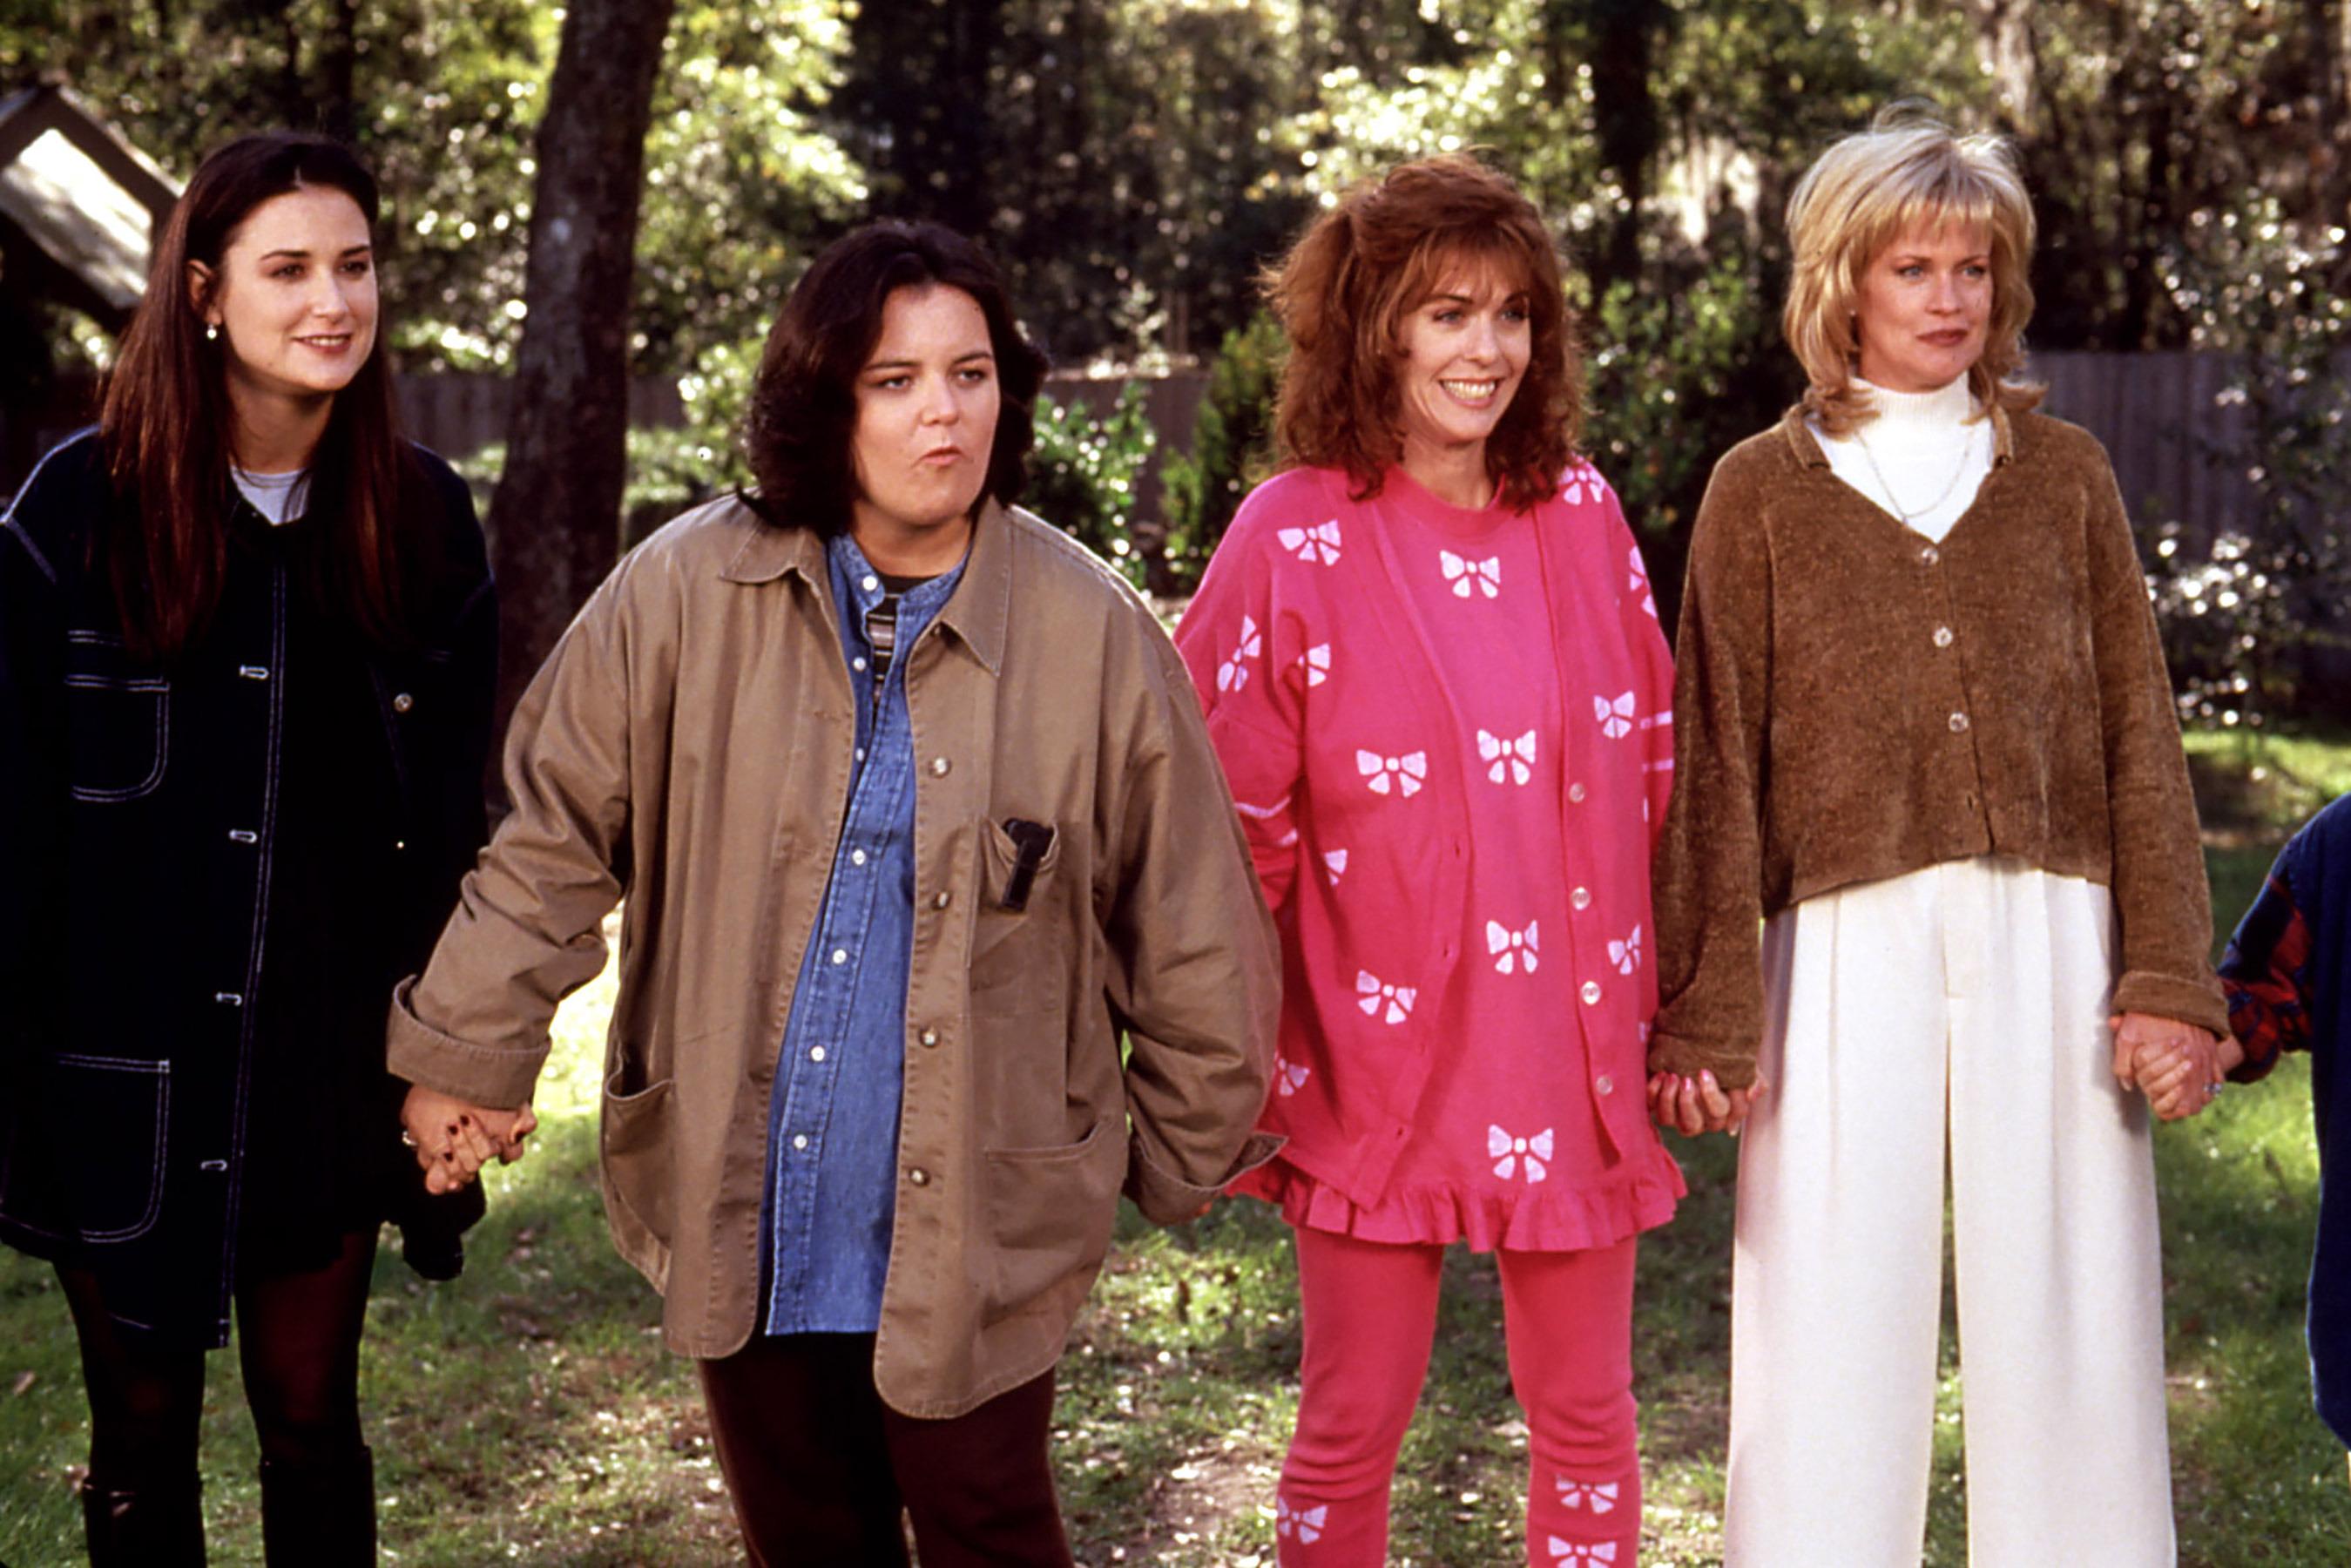 "Elenco adulto de ""Now and Then"": Samantha (Demi Moore), Roberta (Rosie O'Donnell), Chrissy (Rita Wilson) e Teeny (Melanie Griffith)"